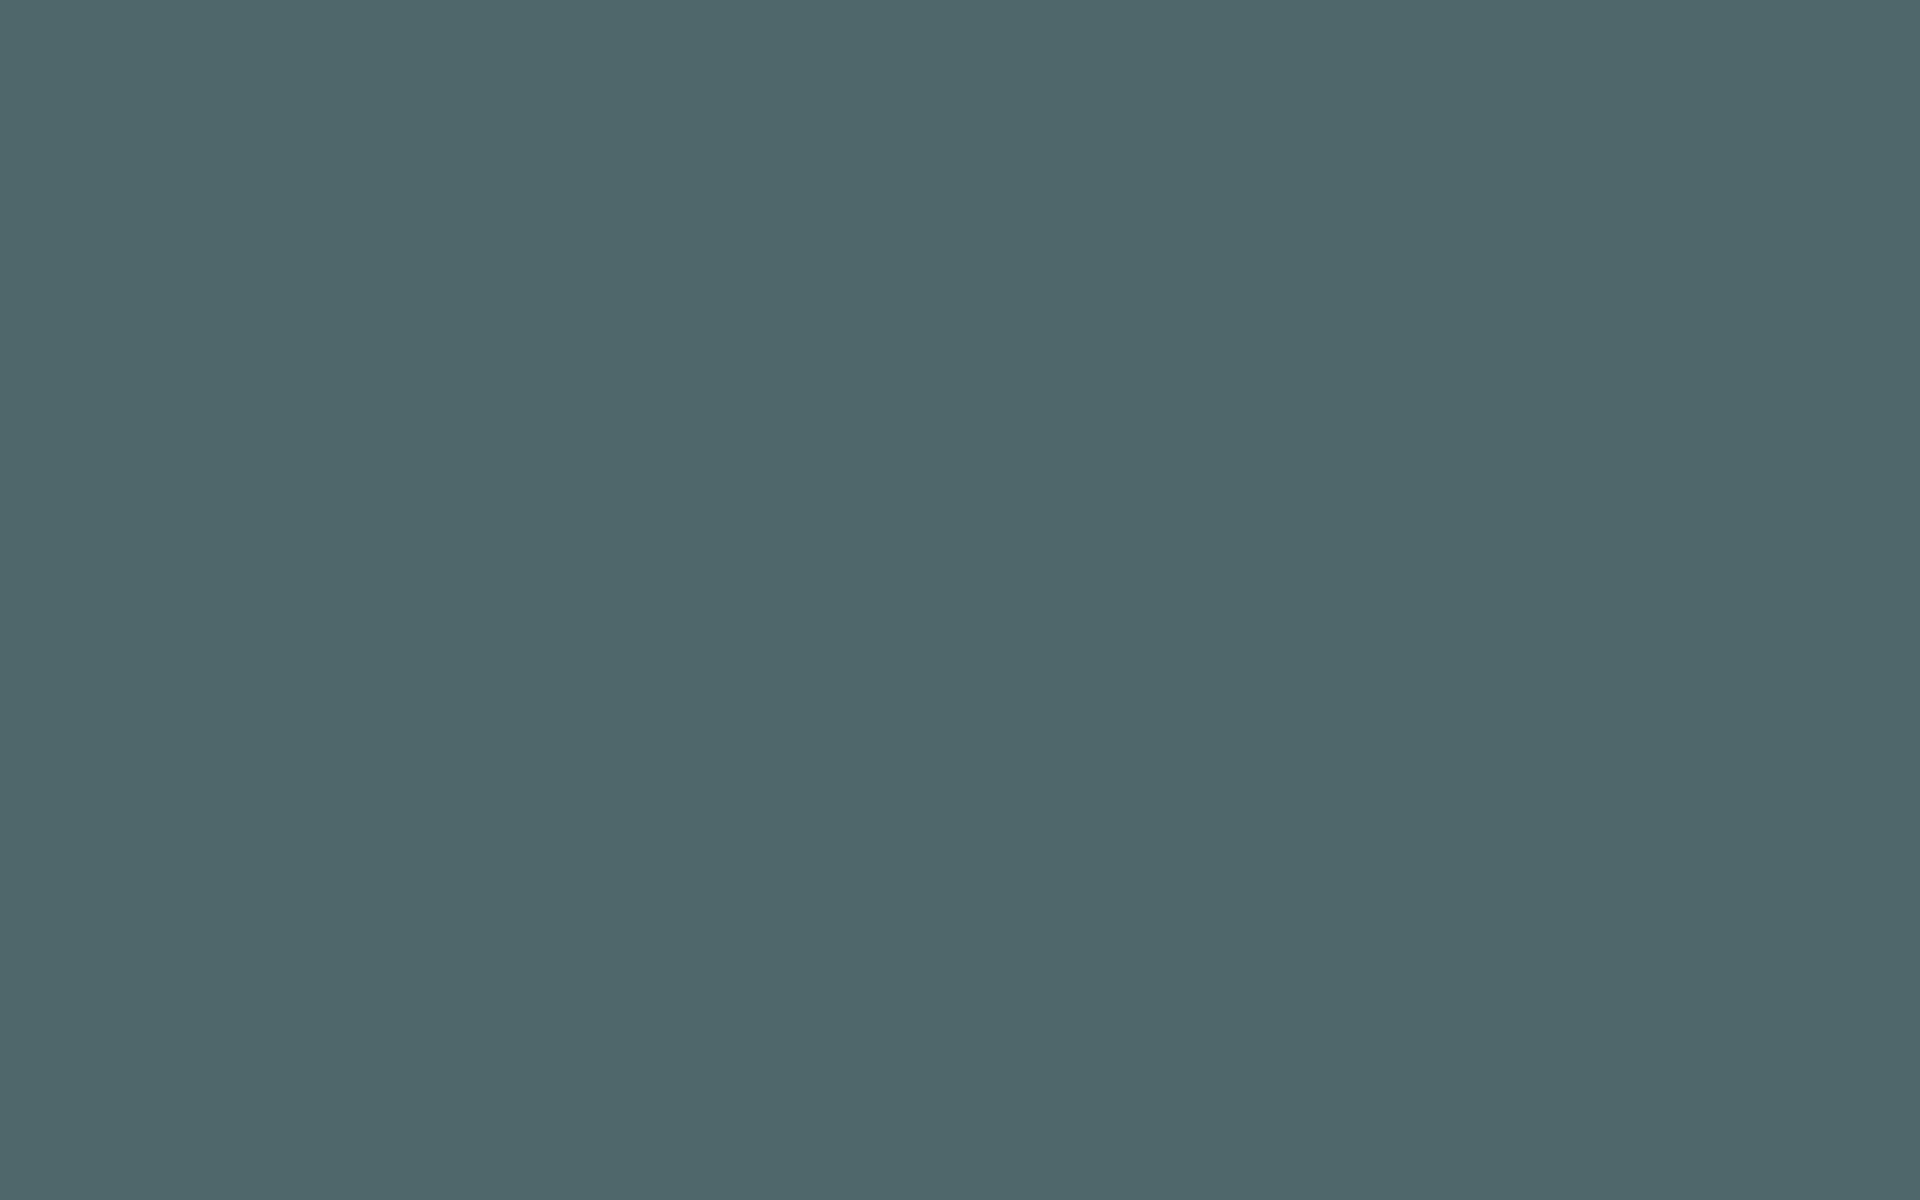 1920x1200 Stormcloud Solid Color Background